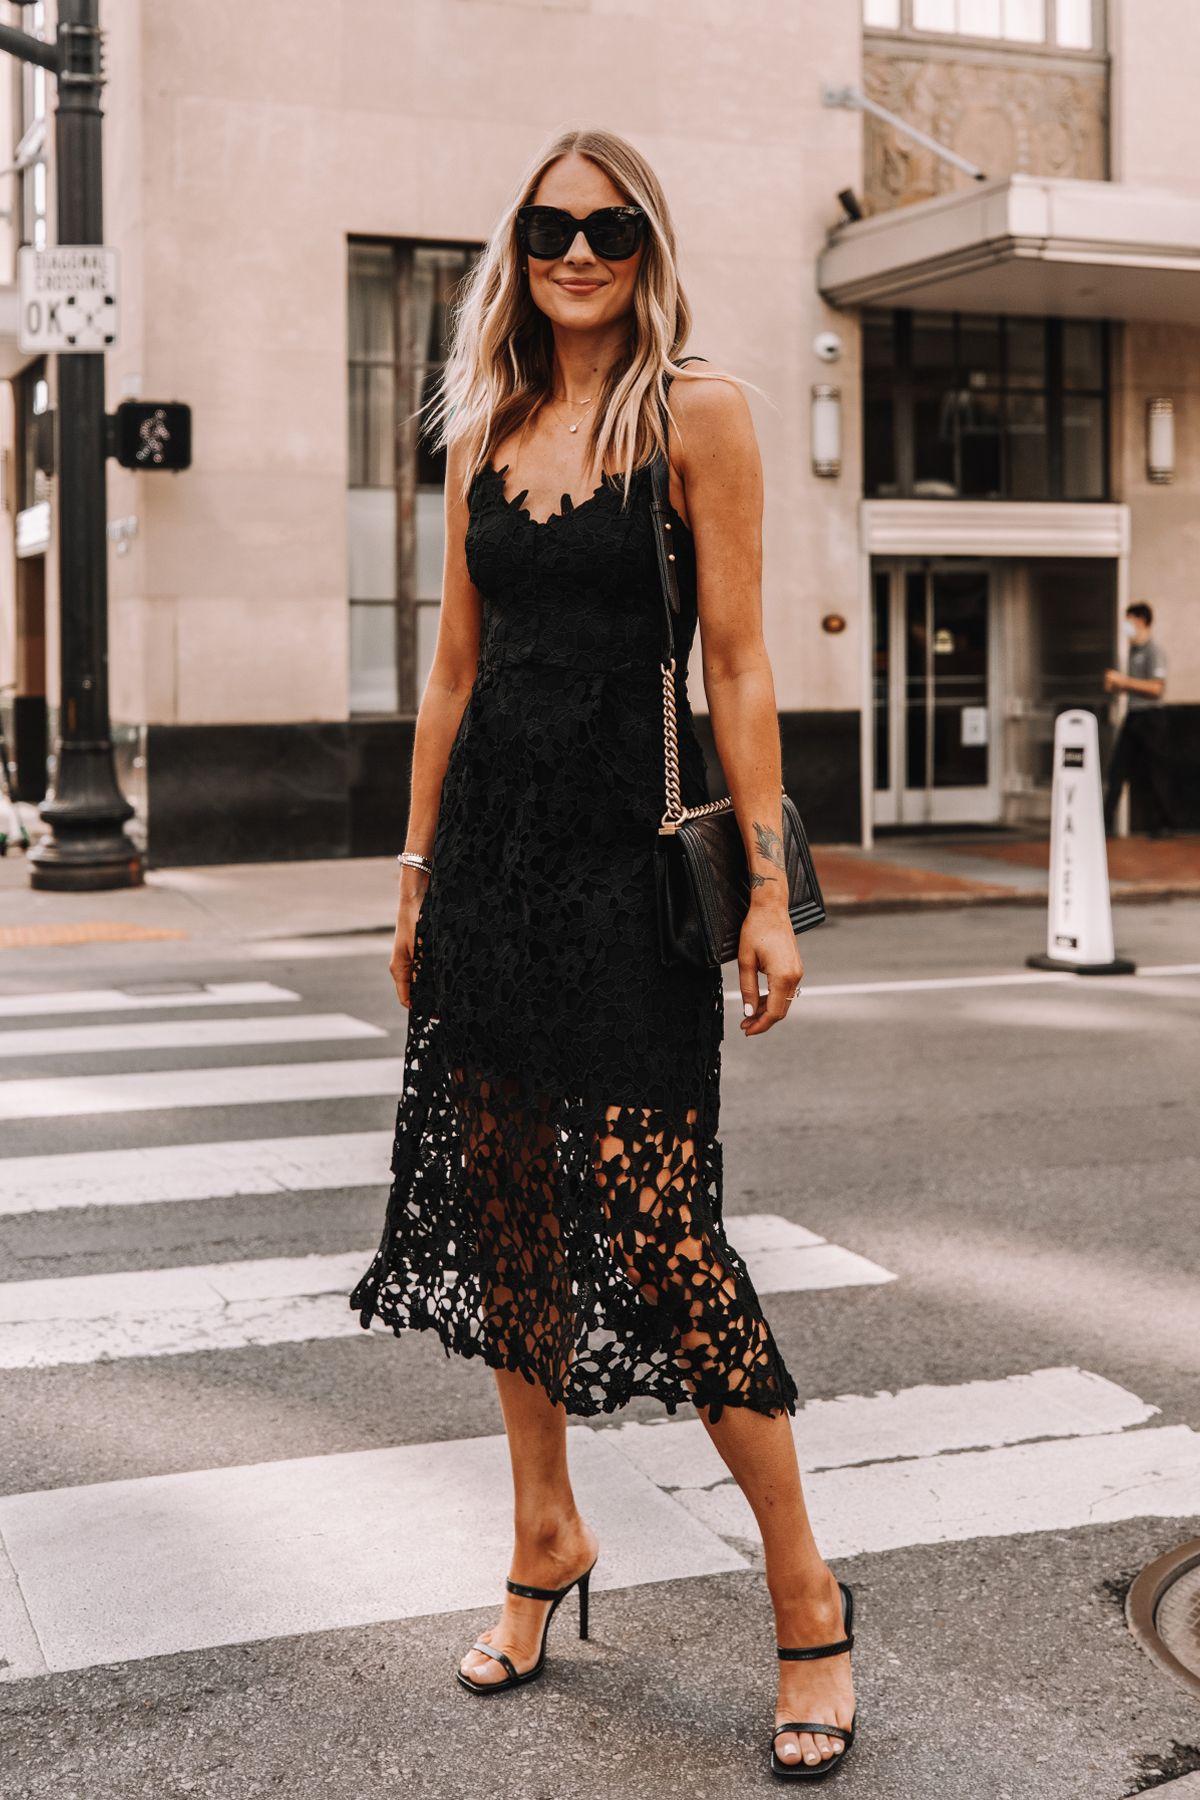 Fashion Jackson Wearing Black Lace Midi Dress Black Heeled Sandals Cocktail Dress 2 In 2020 Womens Black Lace Dress Lace Black Dress Outfit Lace Dress Black [ 1800 x 1200 Pixel ]